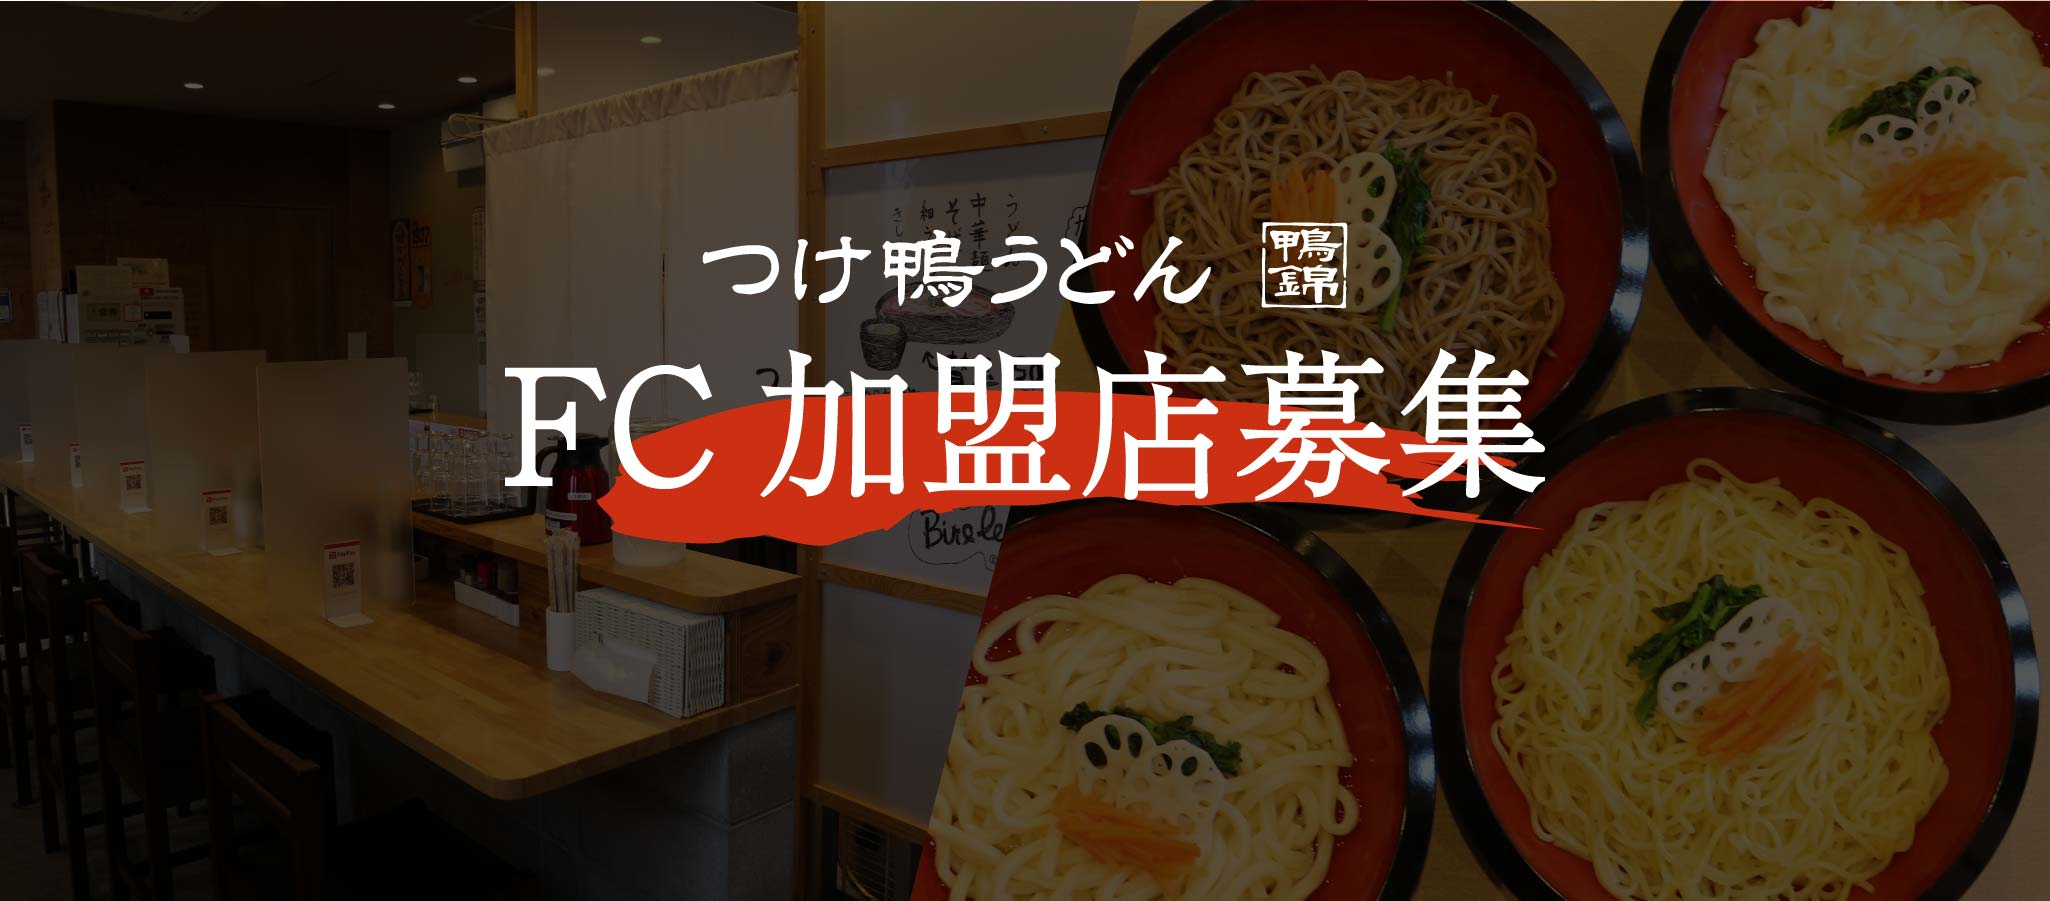 FC募集バナー